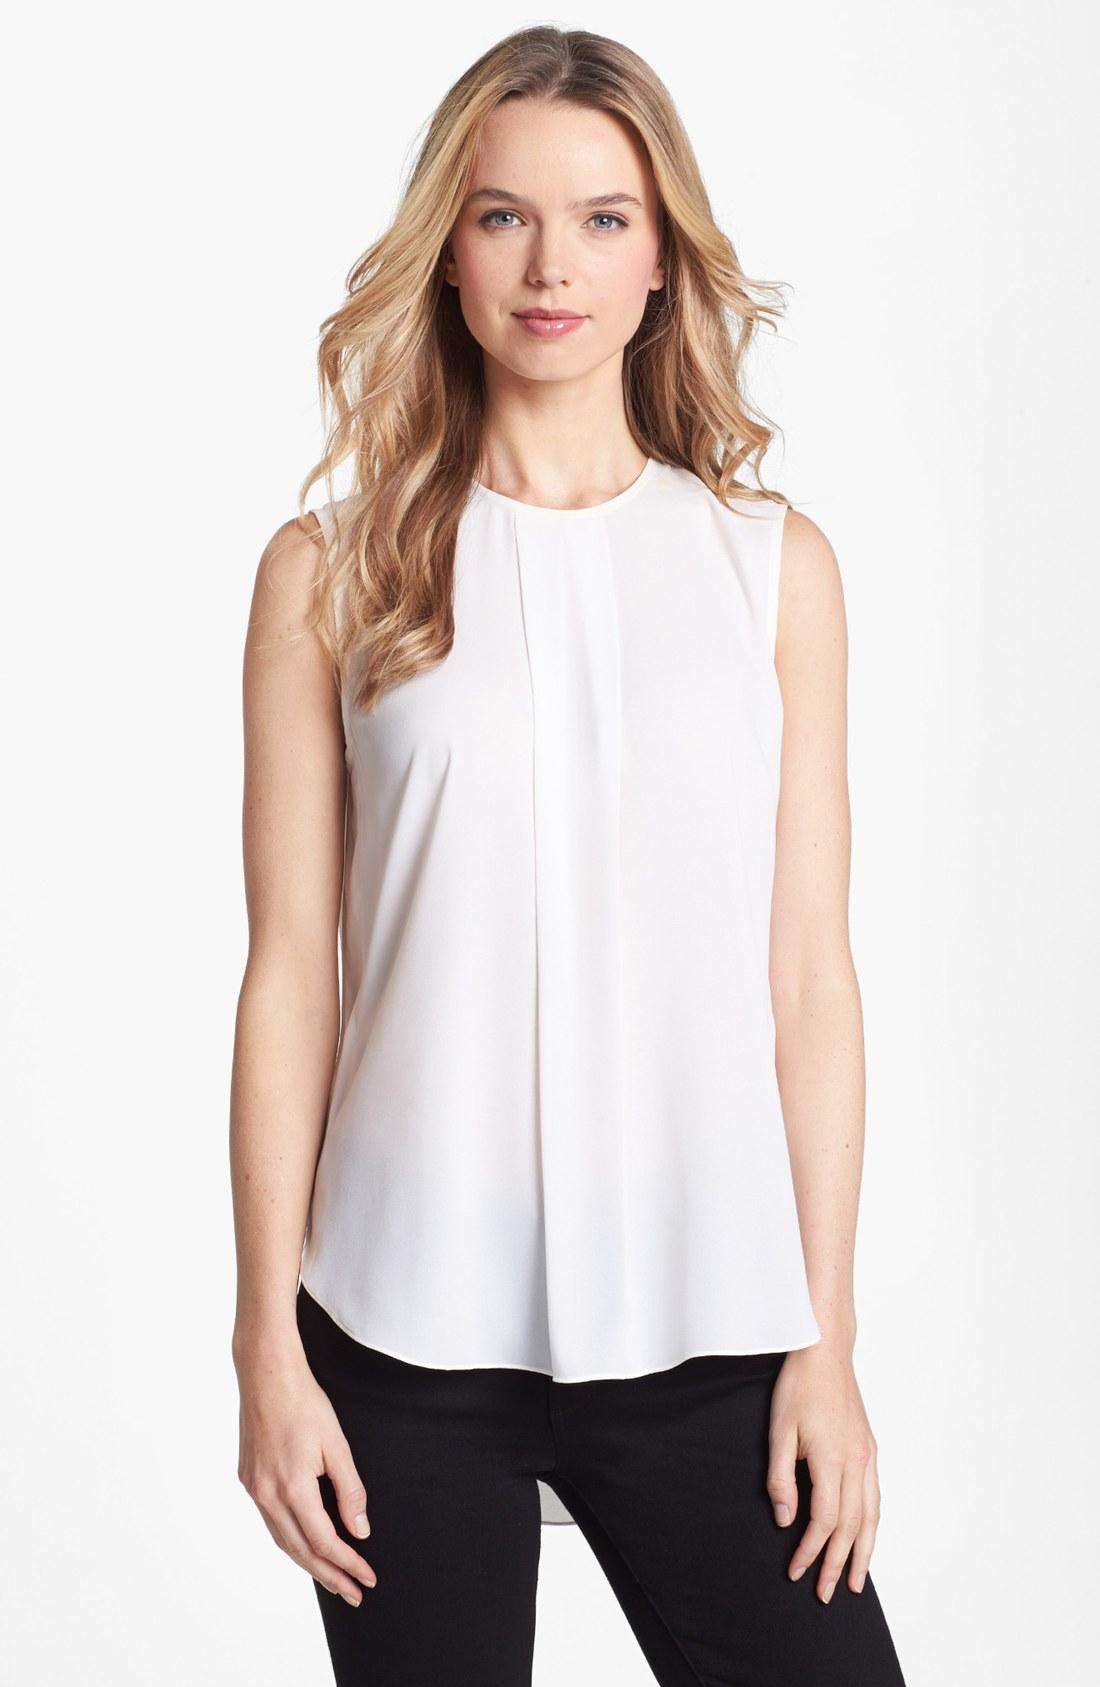 Shop stylish women's sleeveless shirts & blouses at xianggangdishini.gq In irresistible colors, fabrics & styles, LOFT sleeveless shirts & blouses are always cool. Live in what you love - shop xianggangdishini.gq today!